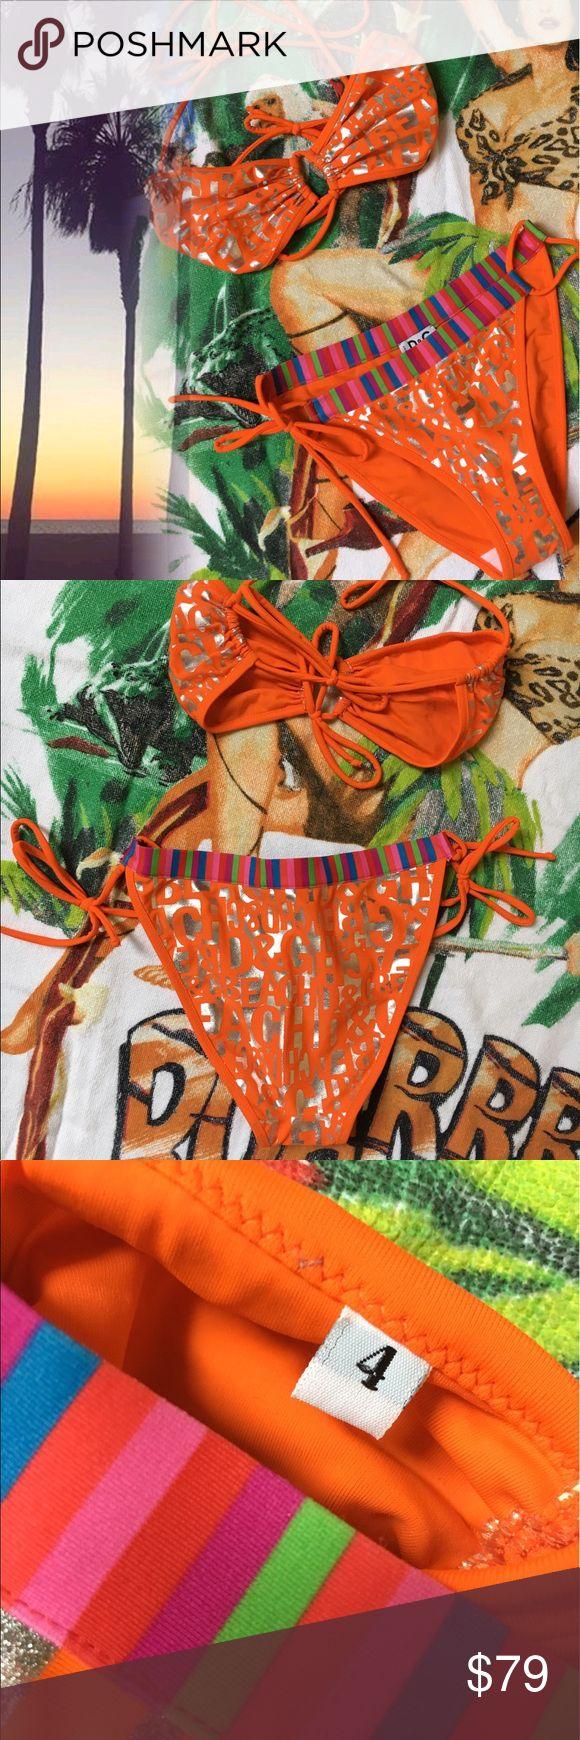 ☀️NEW☀️D&G Bikini New without tags ..keyhole bandeau top with tie straps .. side tie bottoms.. metallic silver spec pattern..pretty bright orange really brings out your tan!! Size 4 EURO/ITL size M/L us Dolce & Gabbana Swim Bikinis